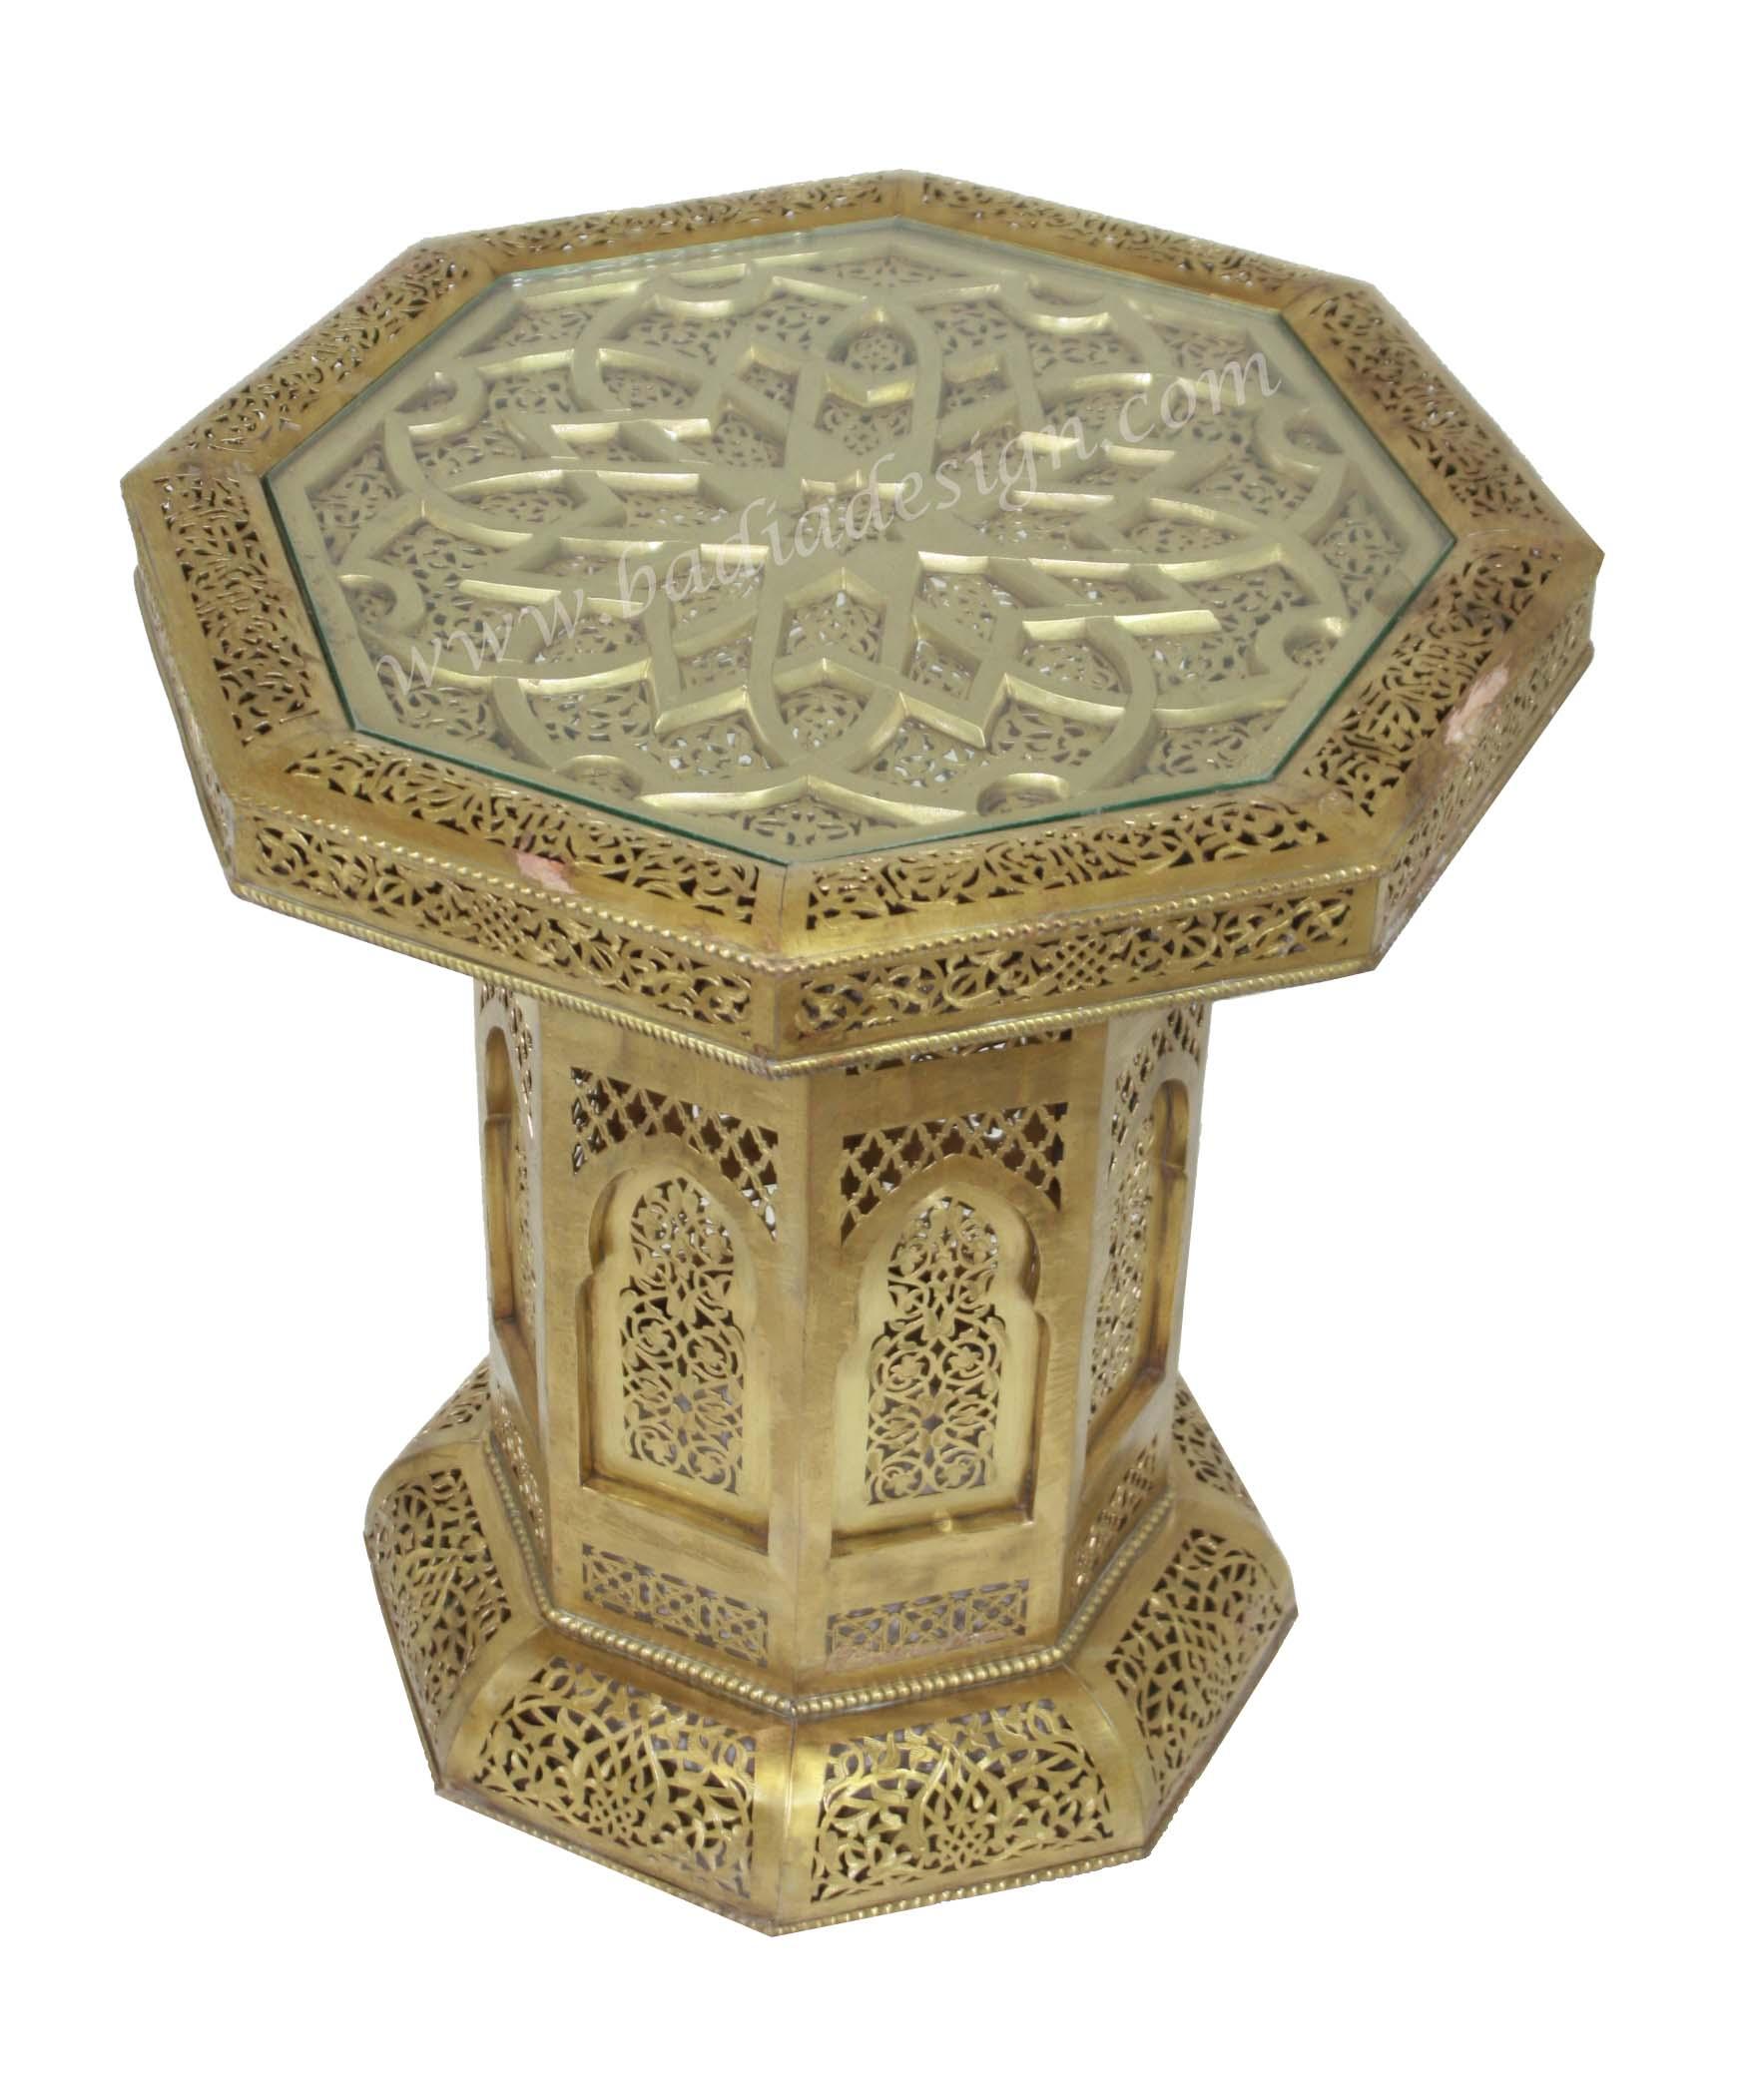 moroccan-brass-side-table-b-lt014-2.jpg